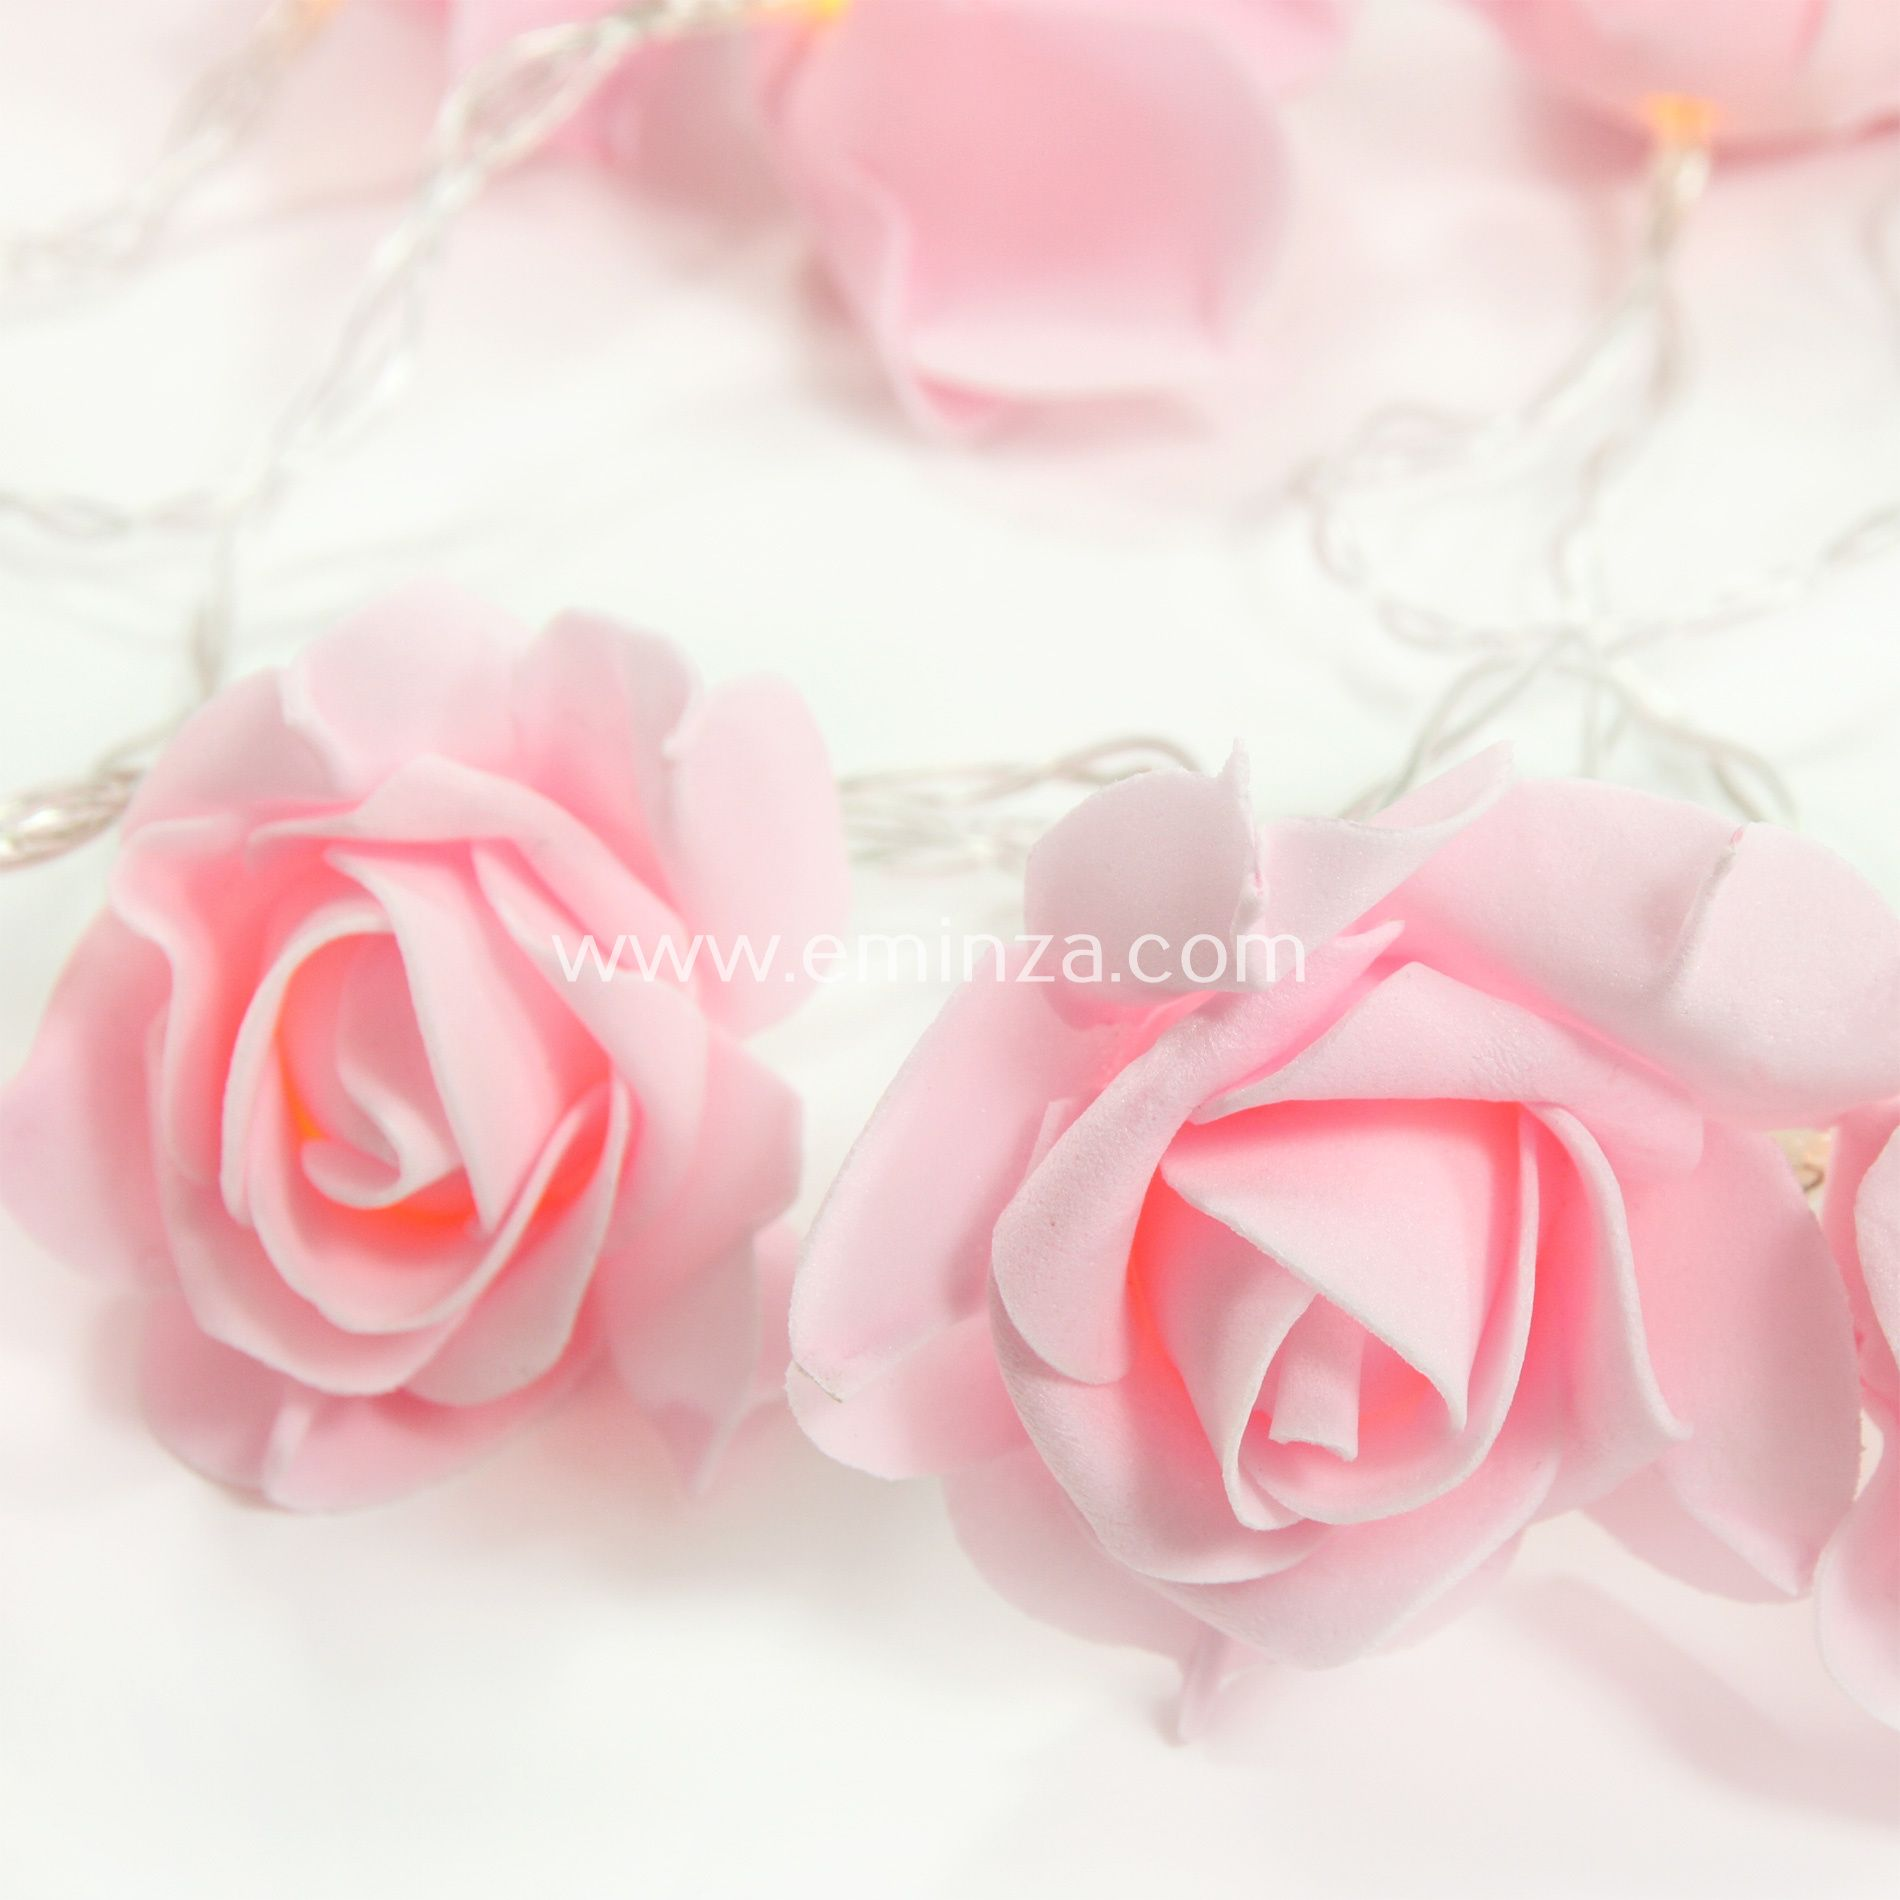 guirlande lumineuse rose blanc chaud 15 led guirlande. Black Bedroom Furniture Sets. Home Design Ideas